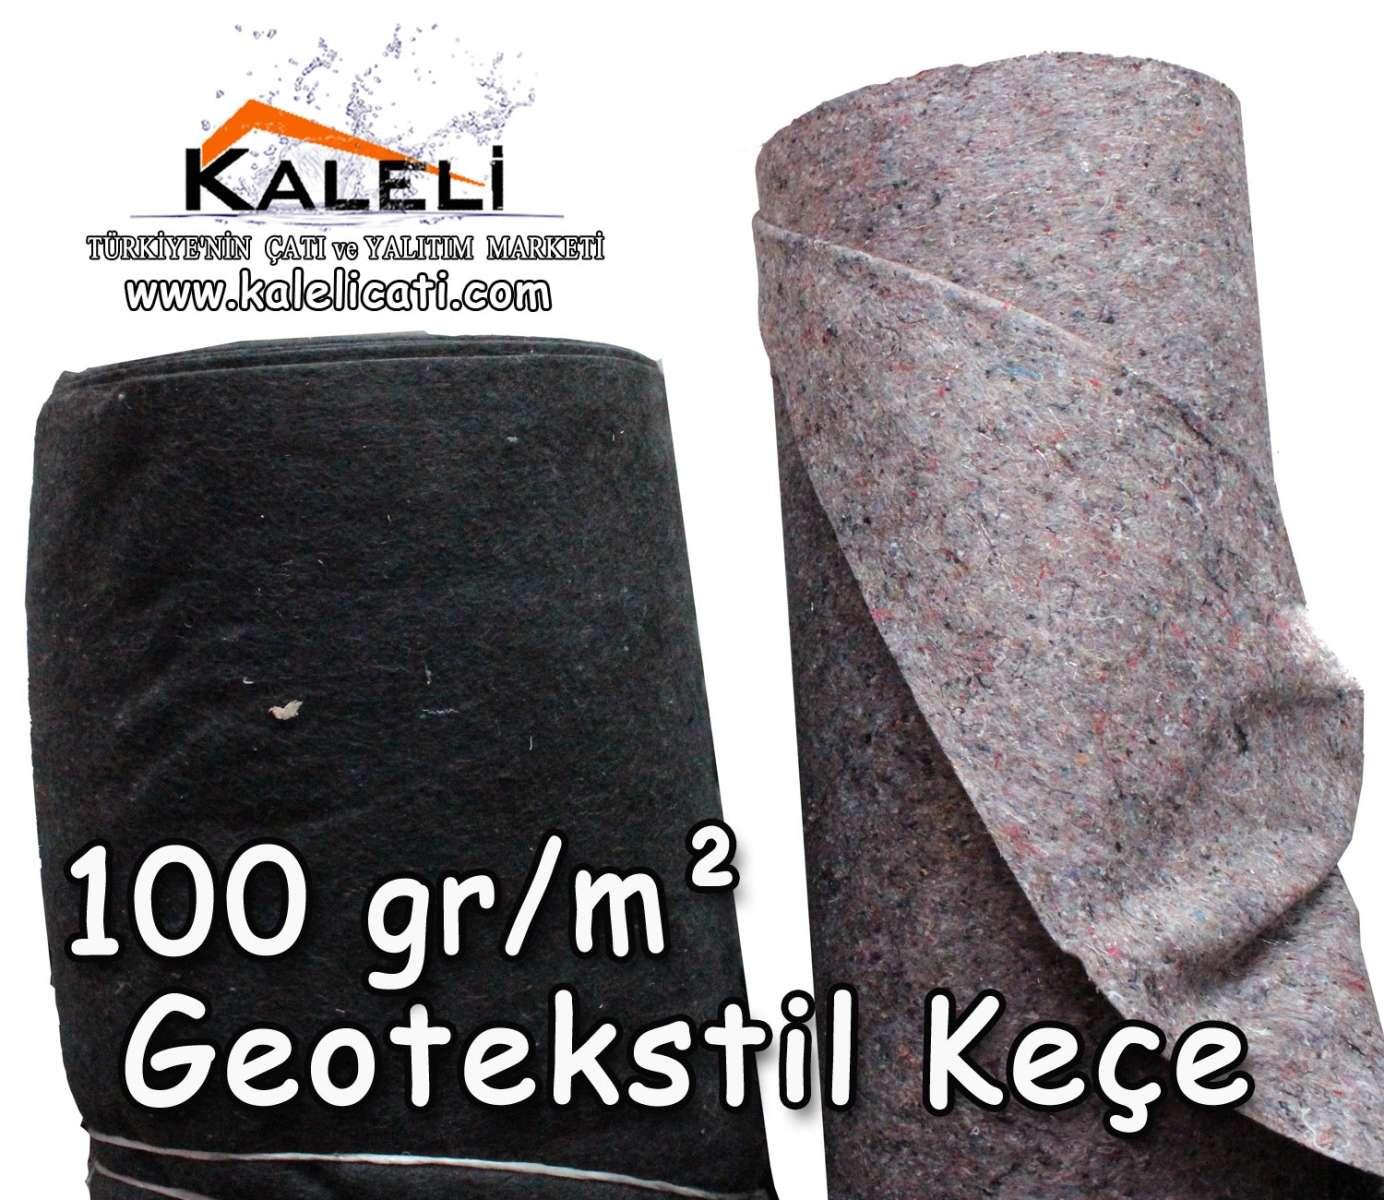 Geotekstil Keçesi 100 gr./m²